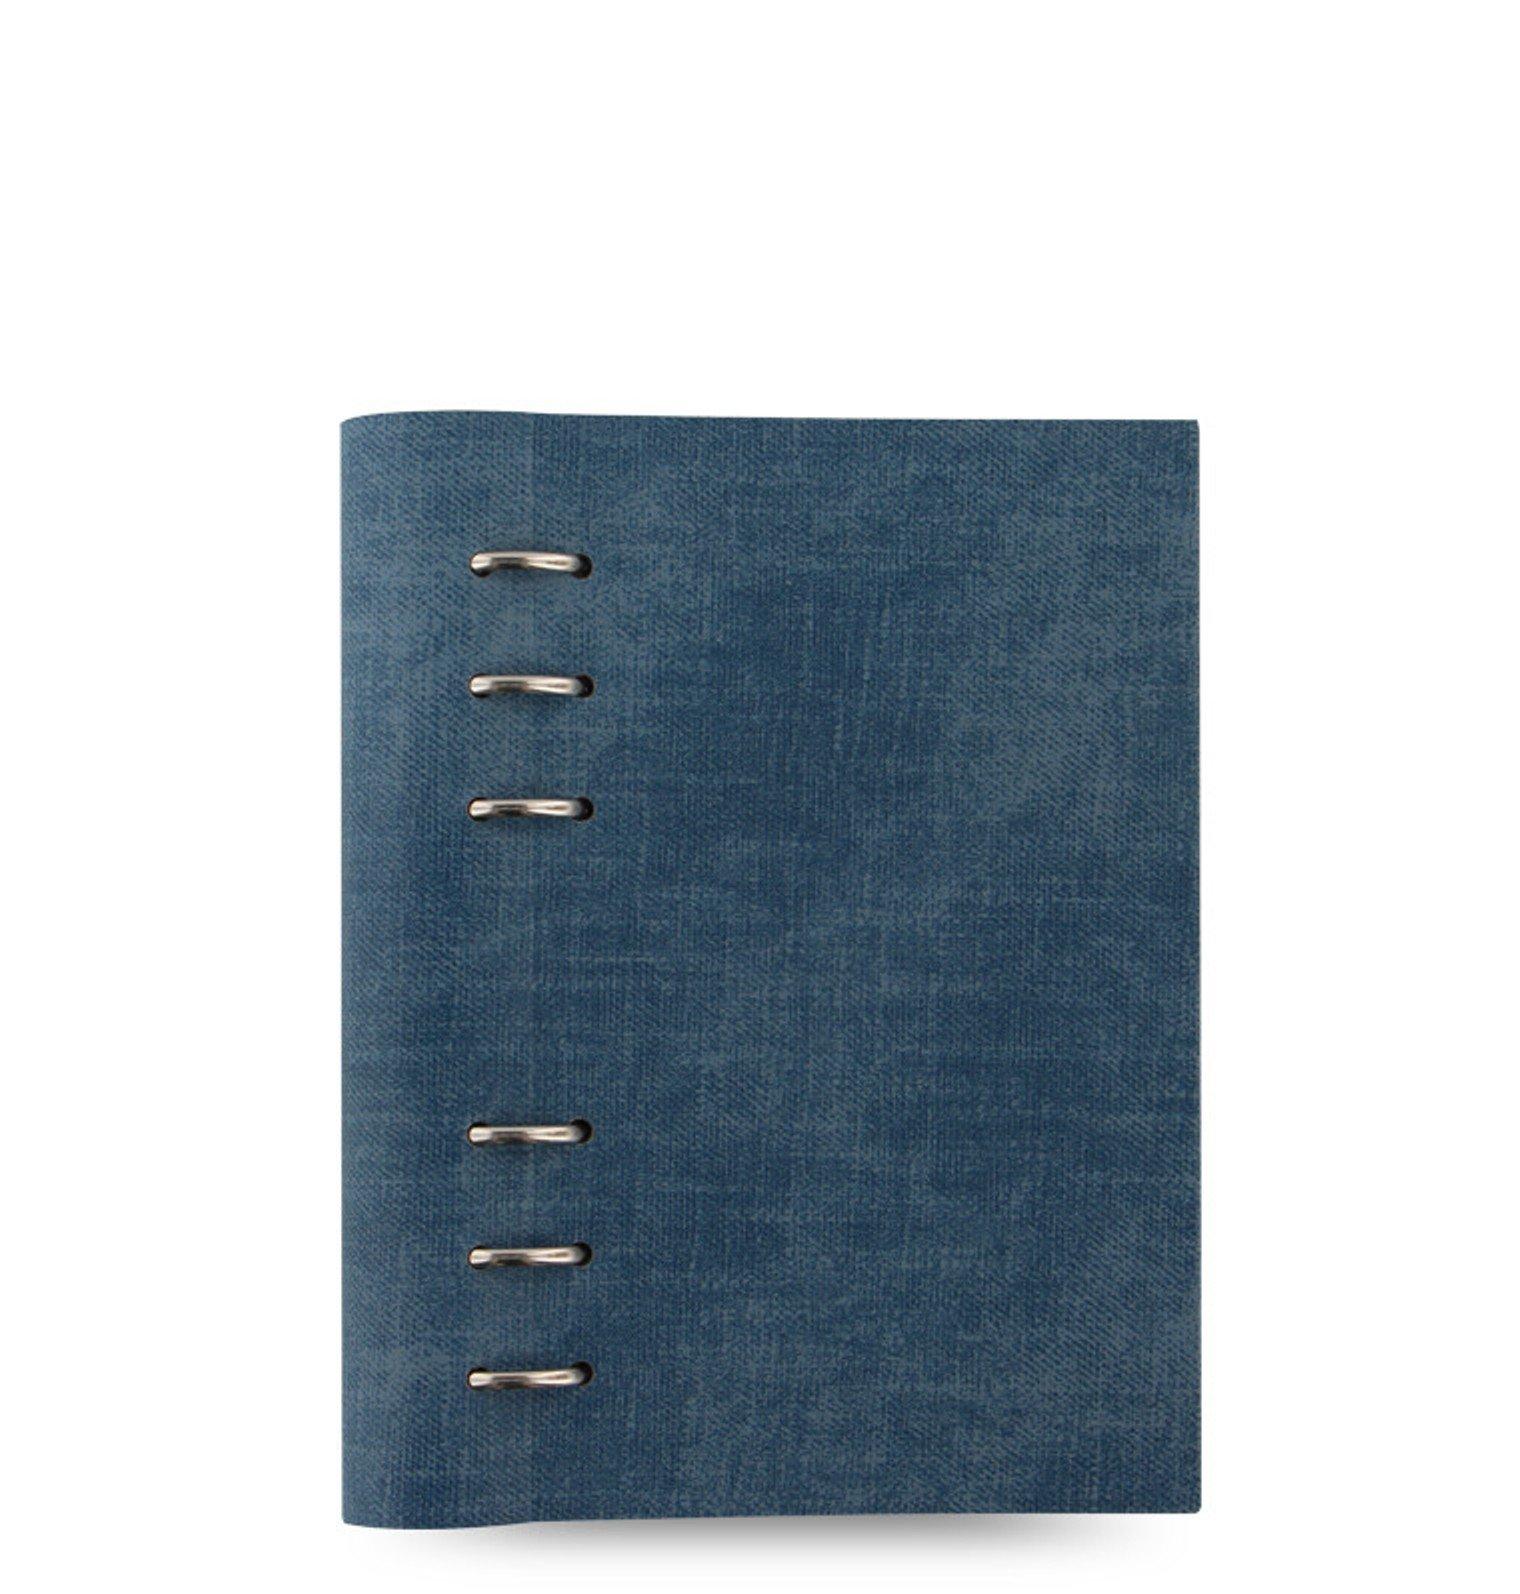 Filofax Clipbook Patterns Denim Personal 25mm A6 Notizbuch Jeansstoff 143002